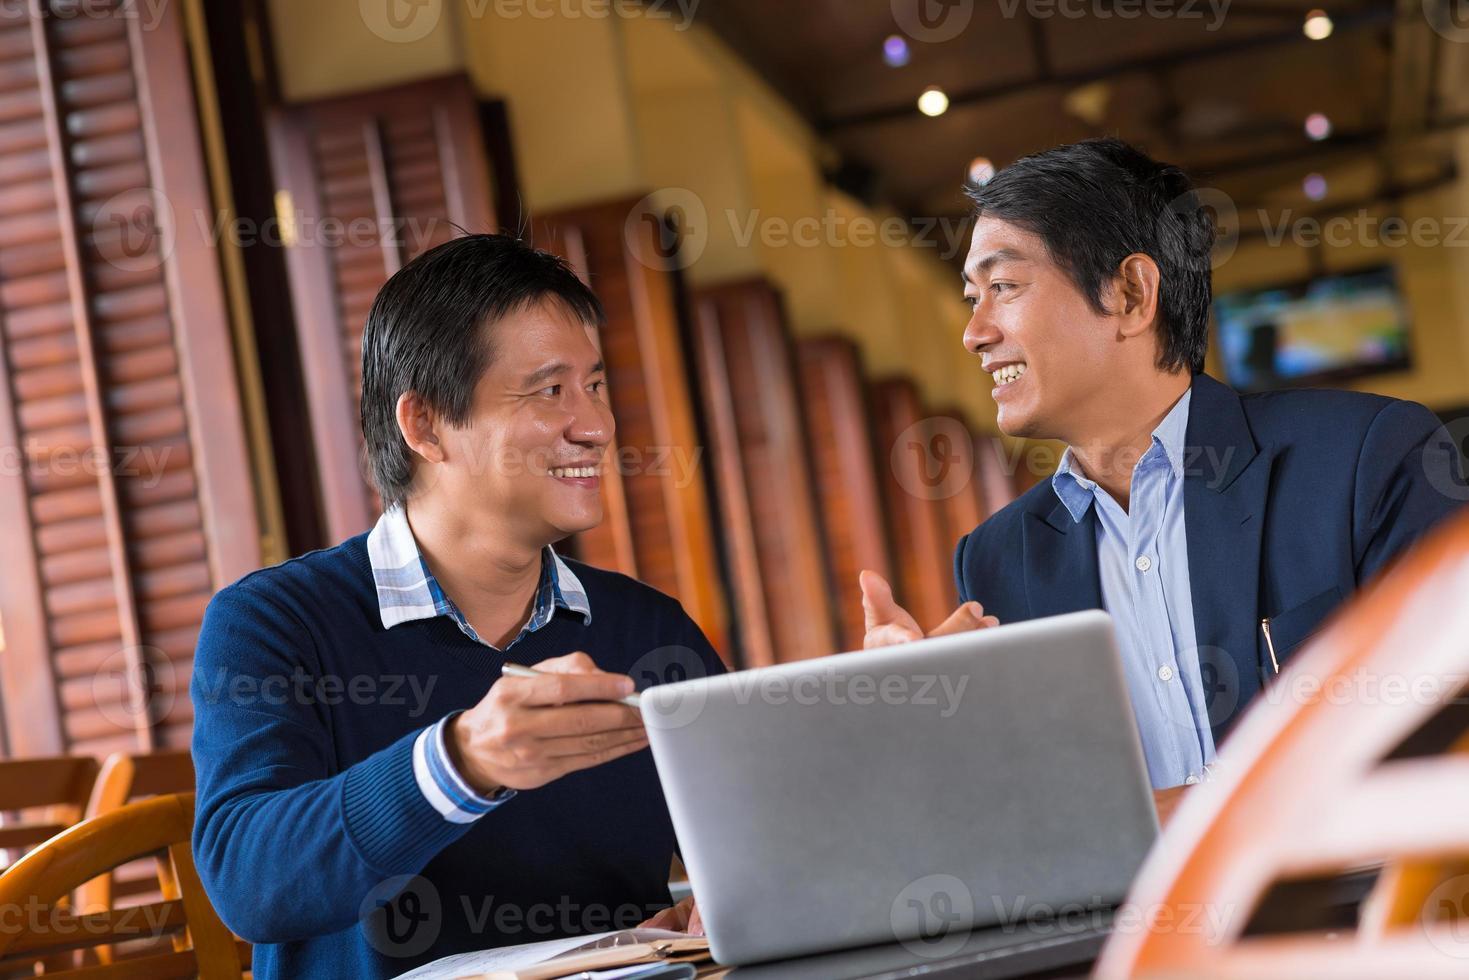 Informationen auf dem Laptop-Bildschirm diskutieren foto